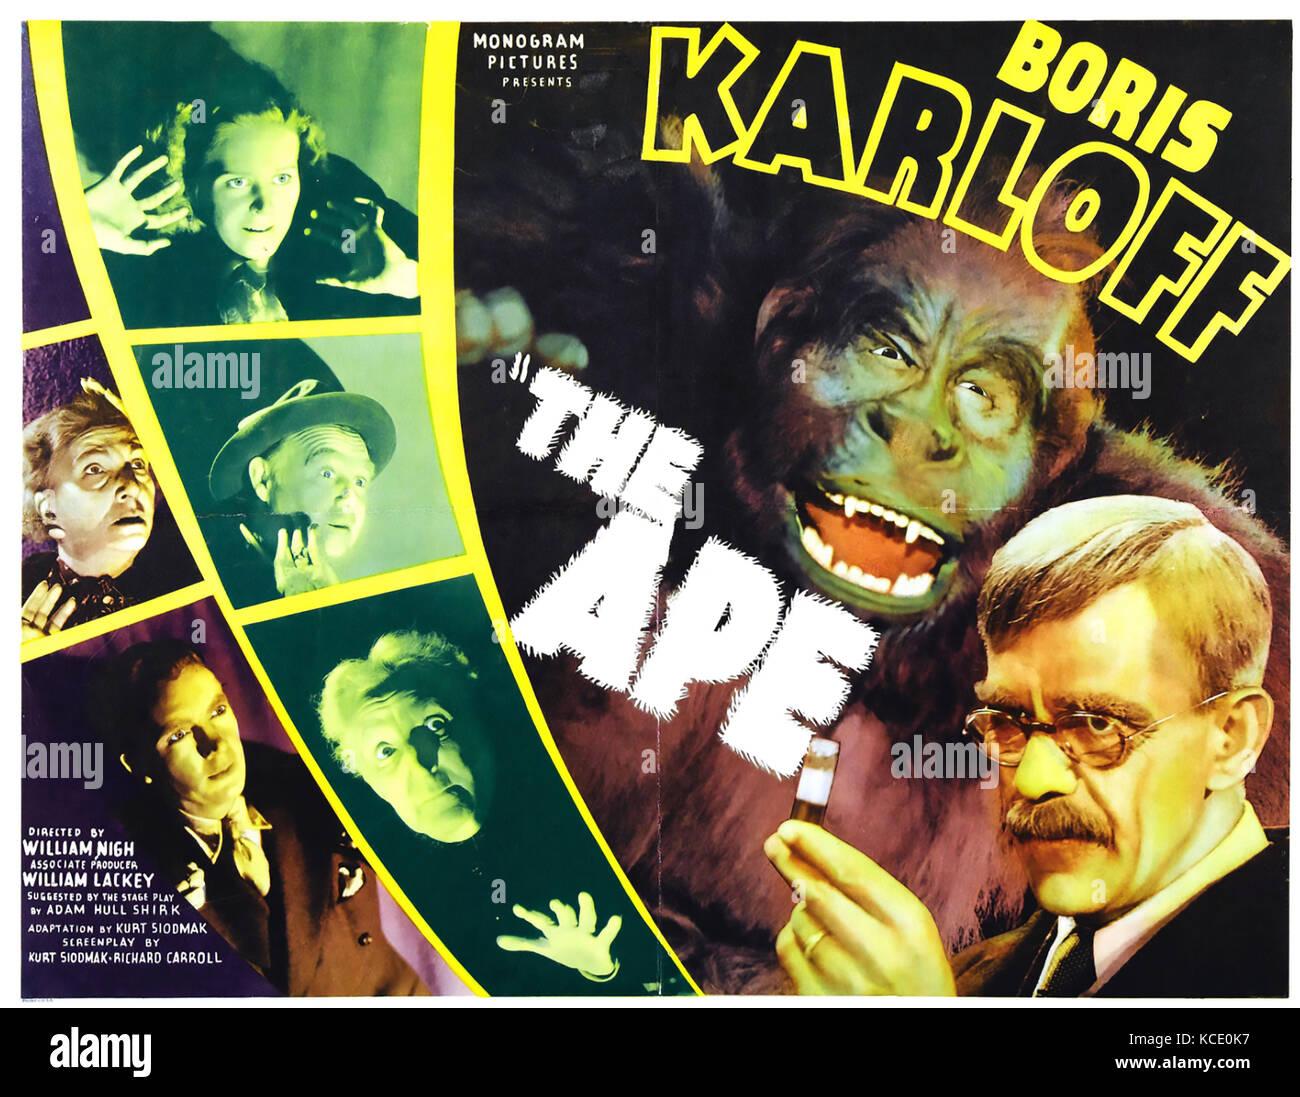 THE APE 1940 Monogram Pictures horror film with Boris Karloff - Stock Image